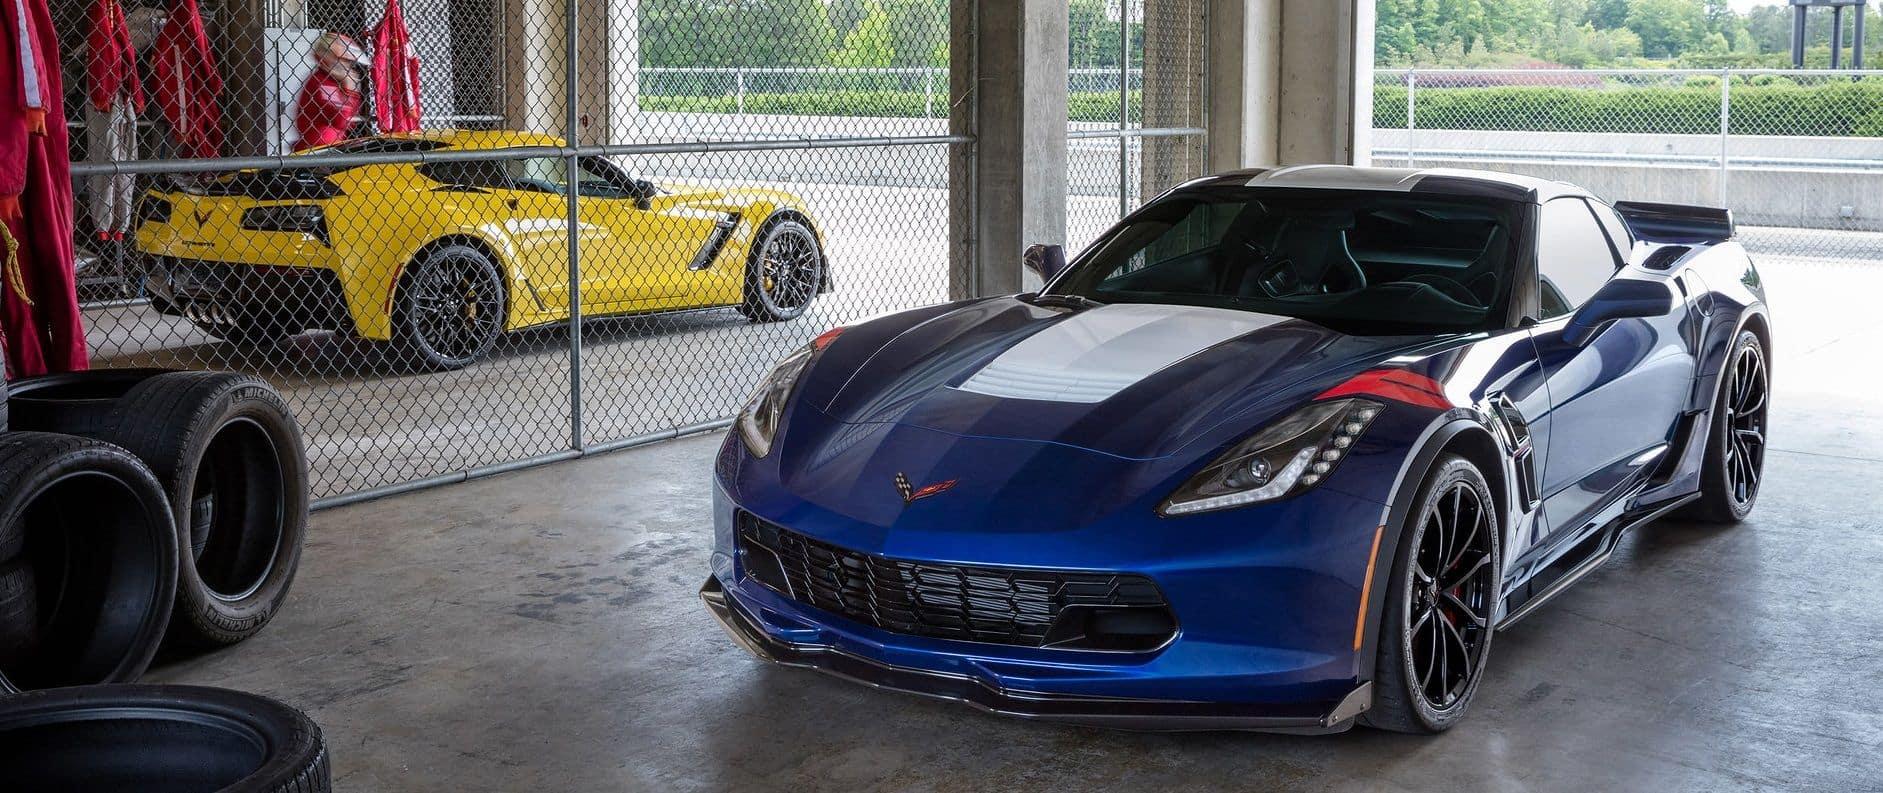 2019 Chevy Corvette Grand Sport | Okarche, OK